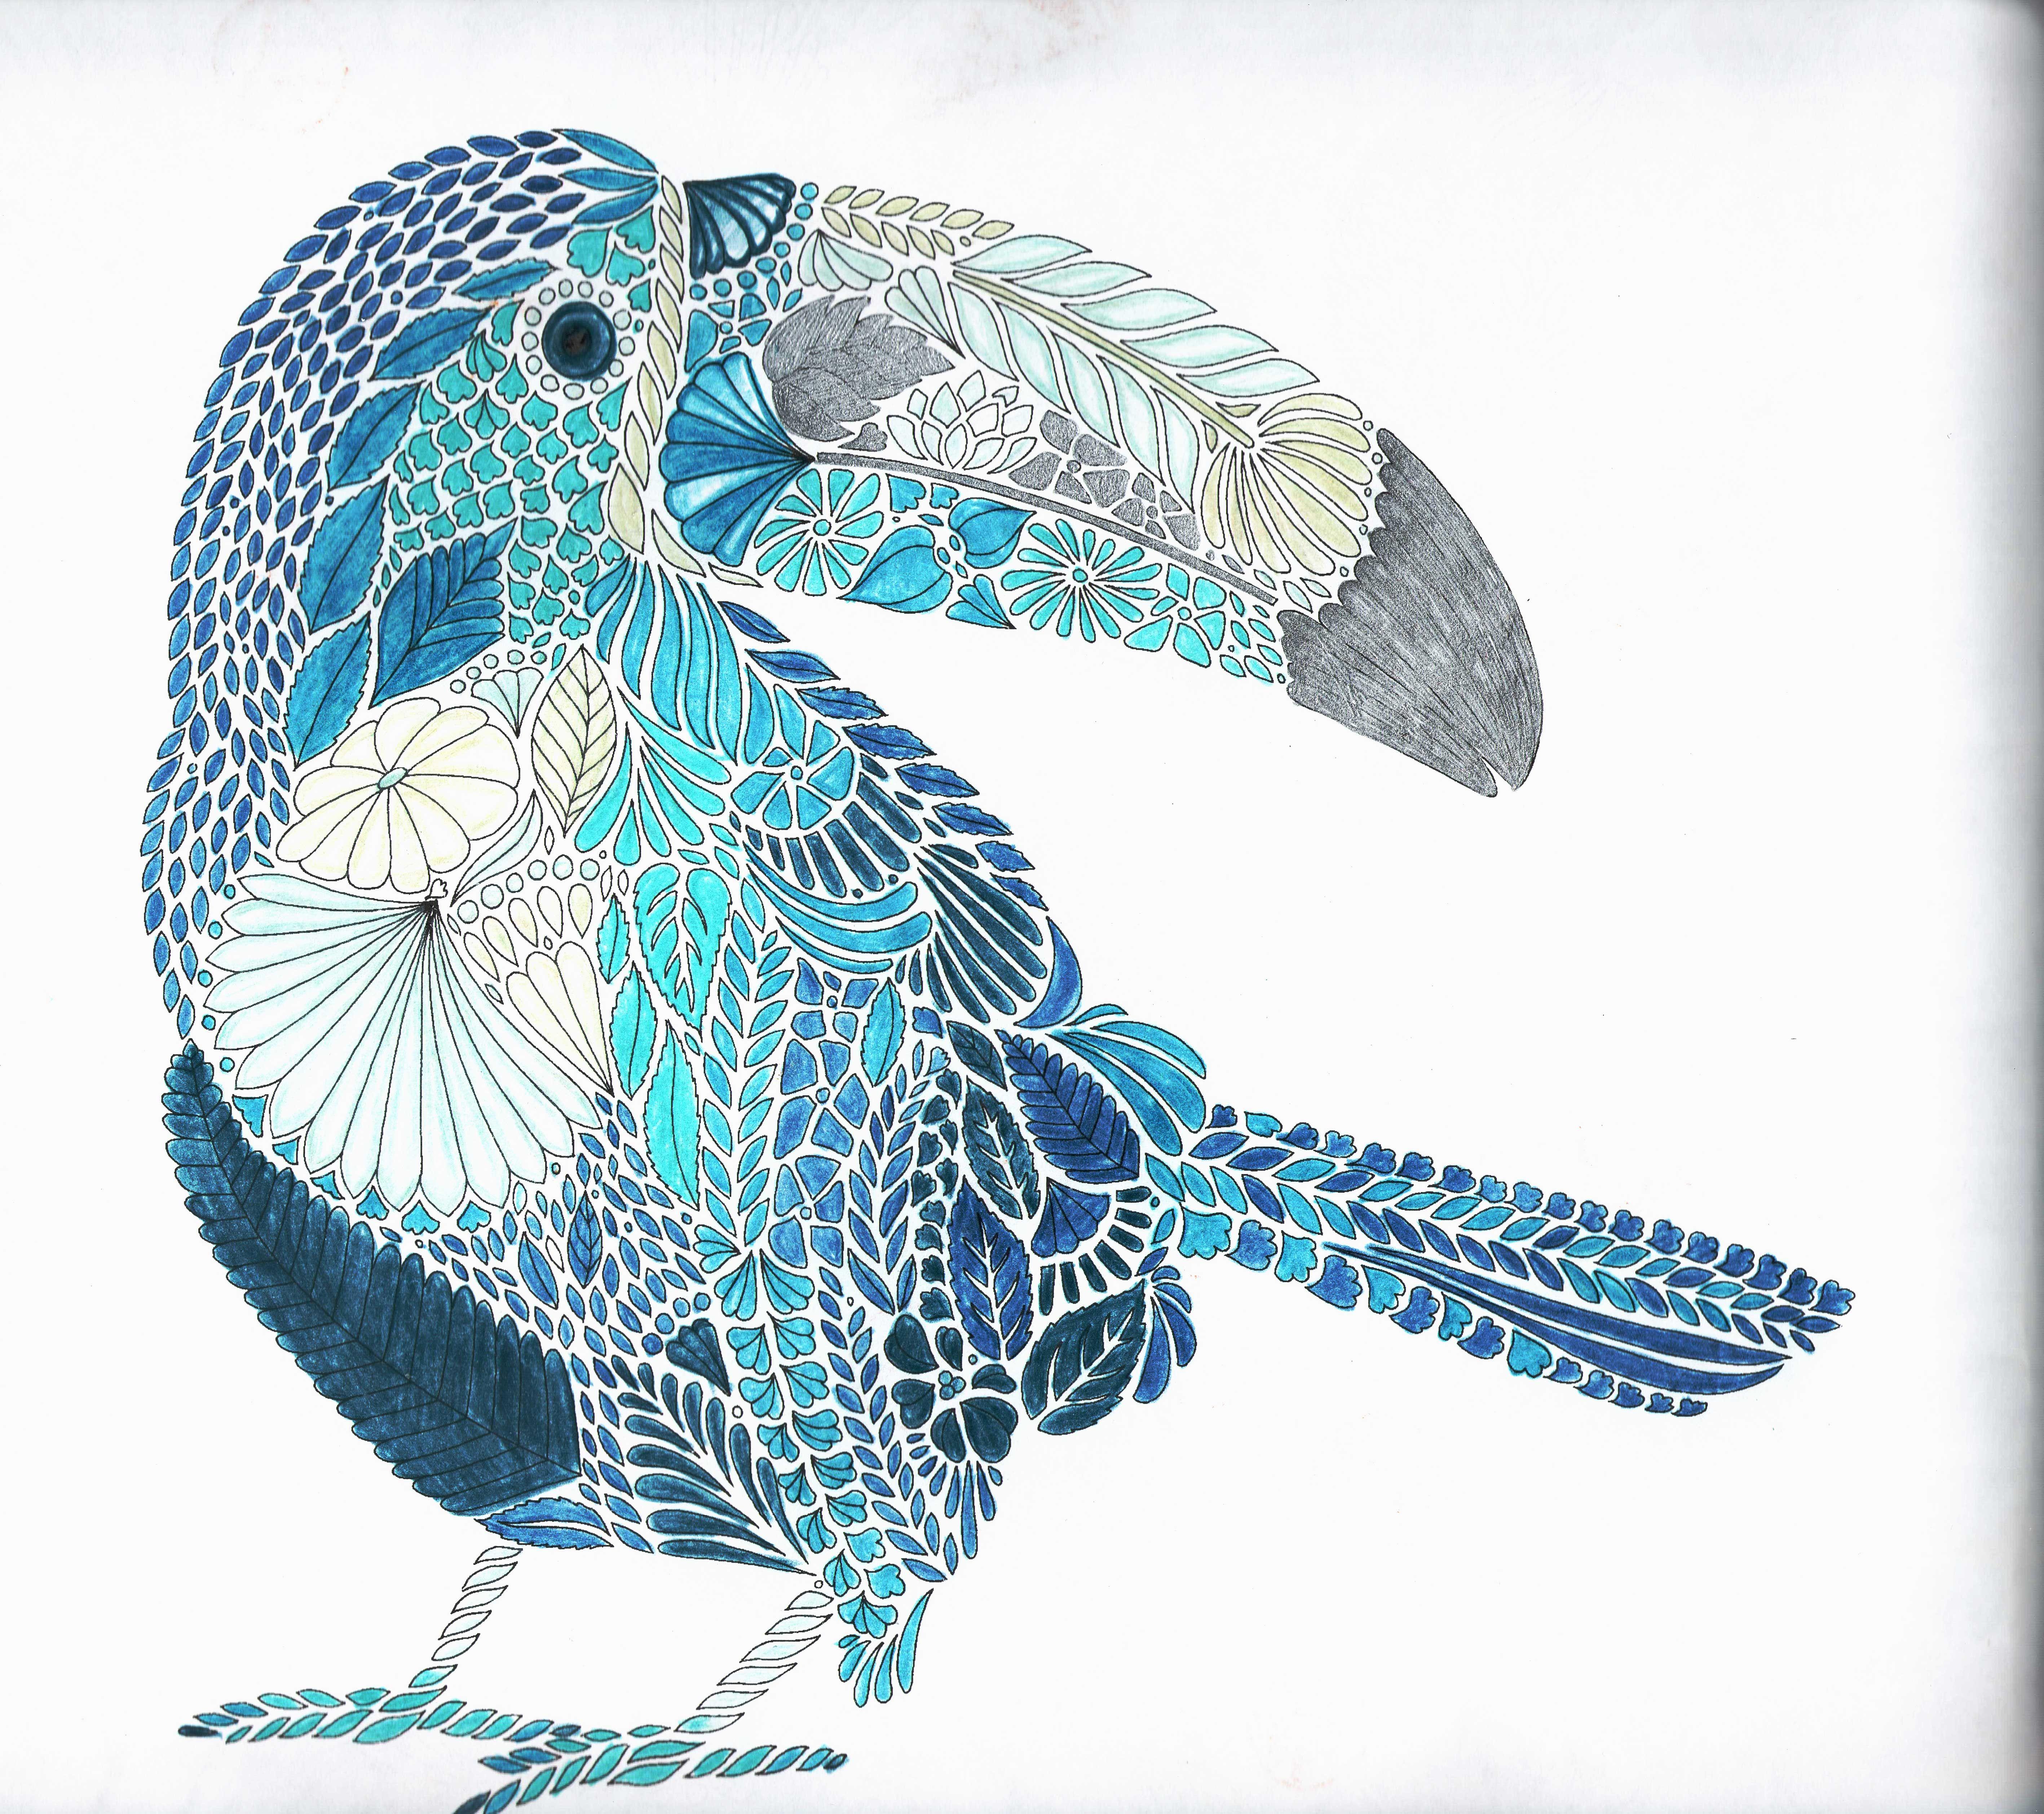 Millie Marotta Tropical World Tucan Adult ColoringColoring BooksColouringBird